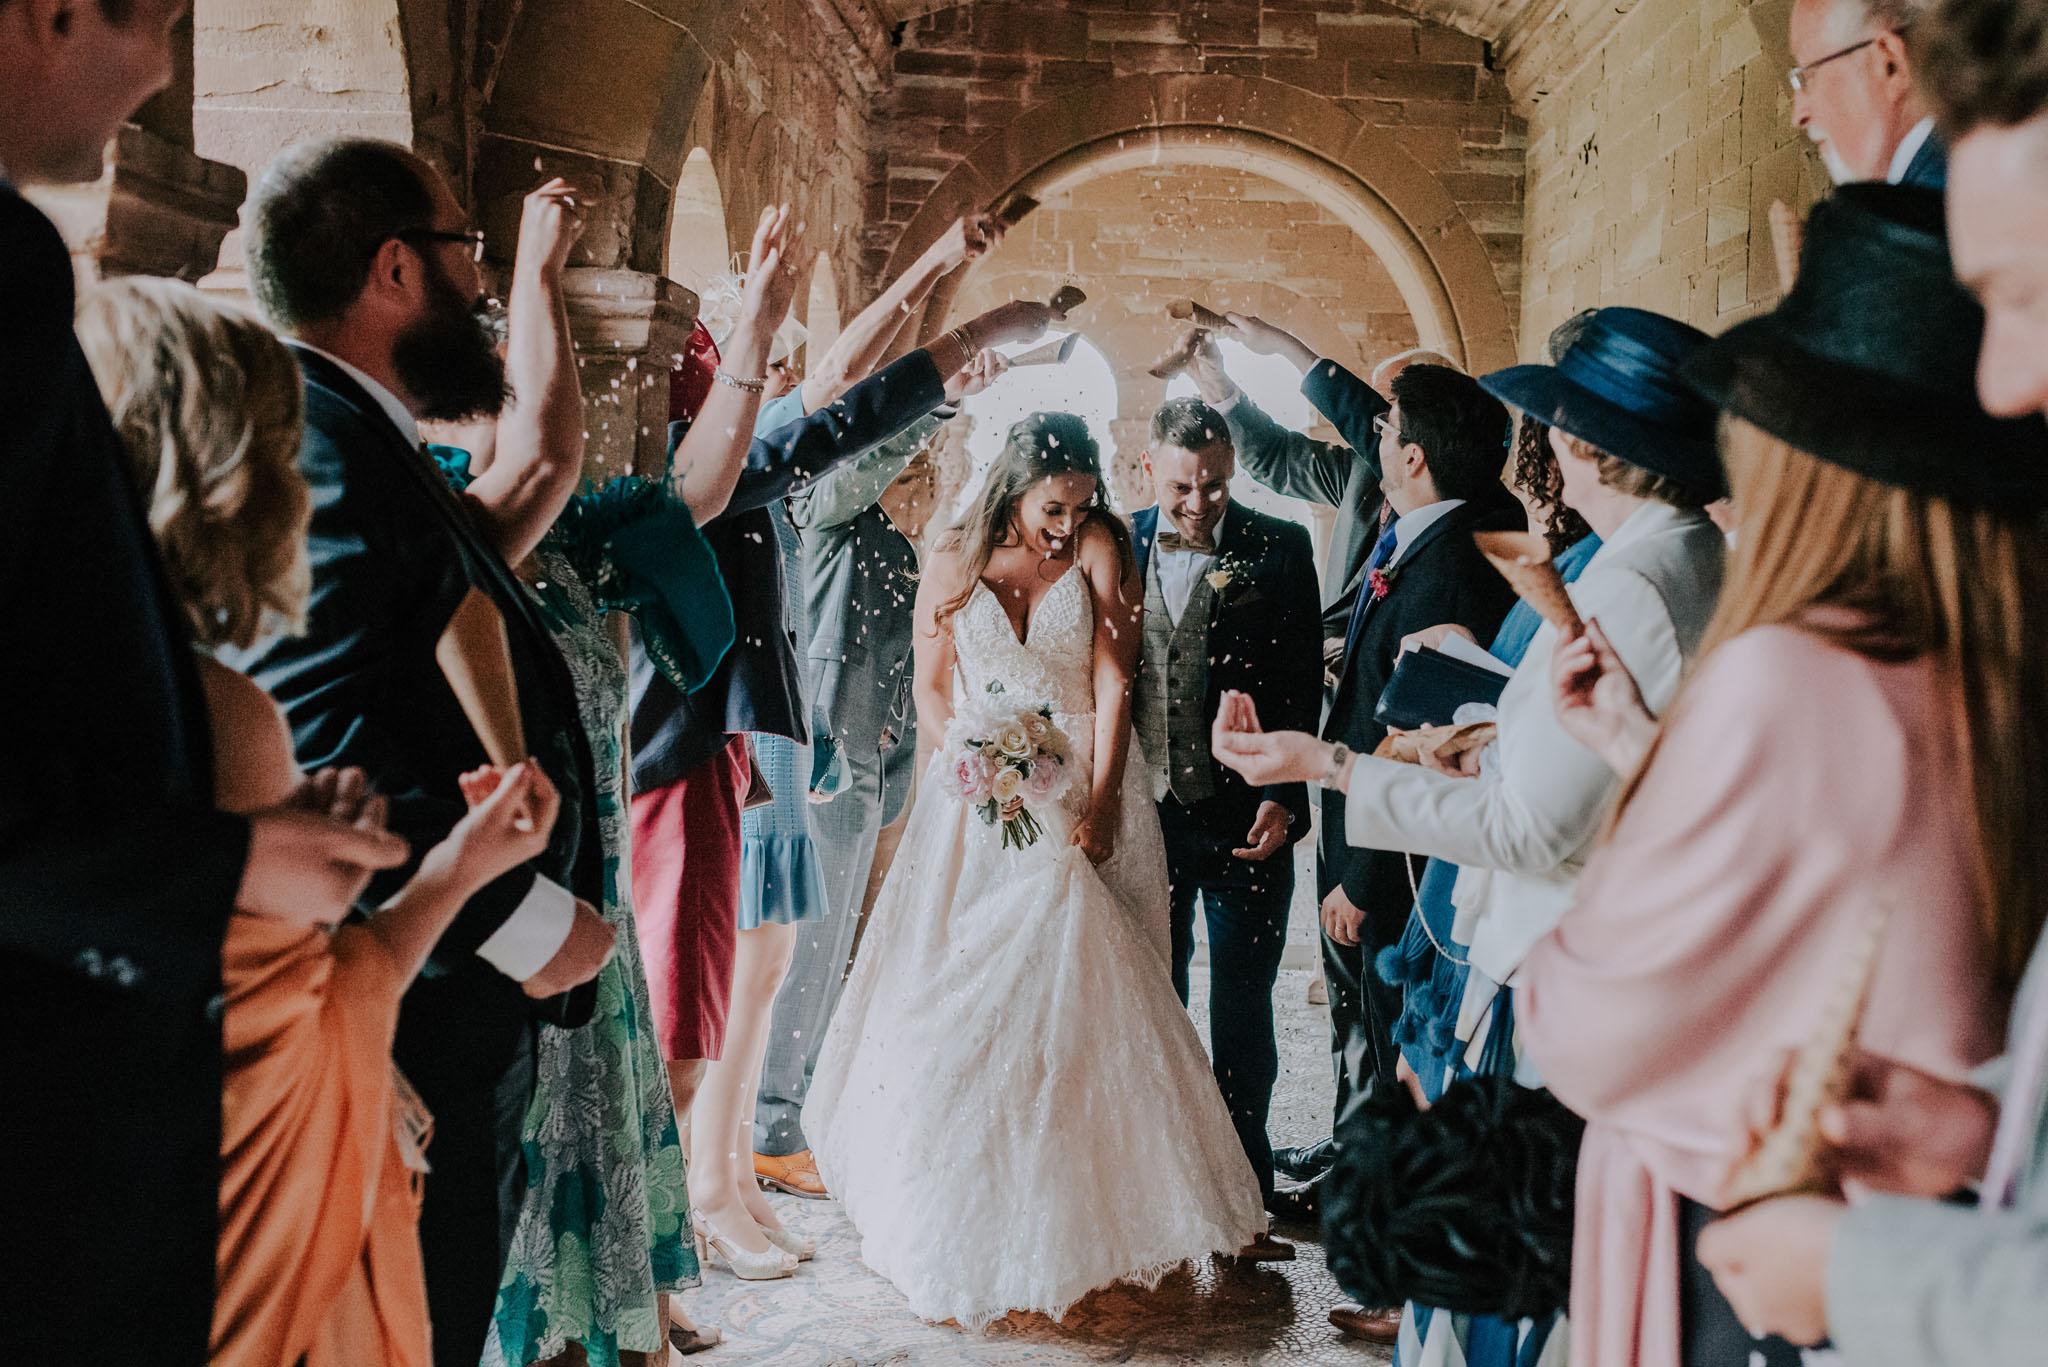 wedding-photographer-glewstone-court-hereford-scott-stockwell-photography260.jpg